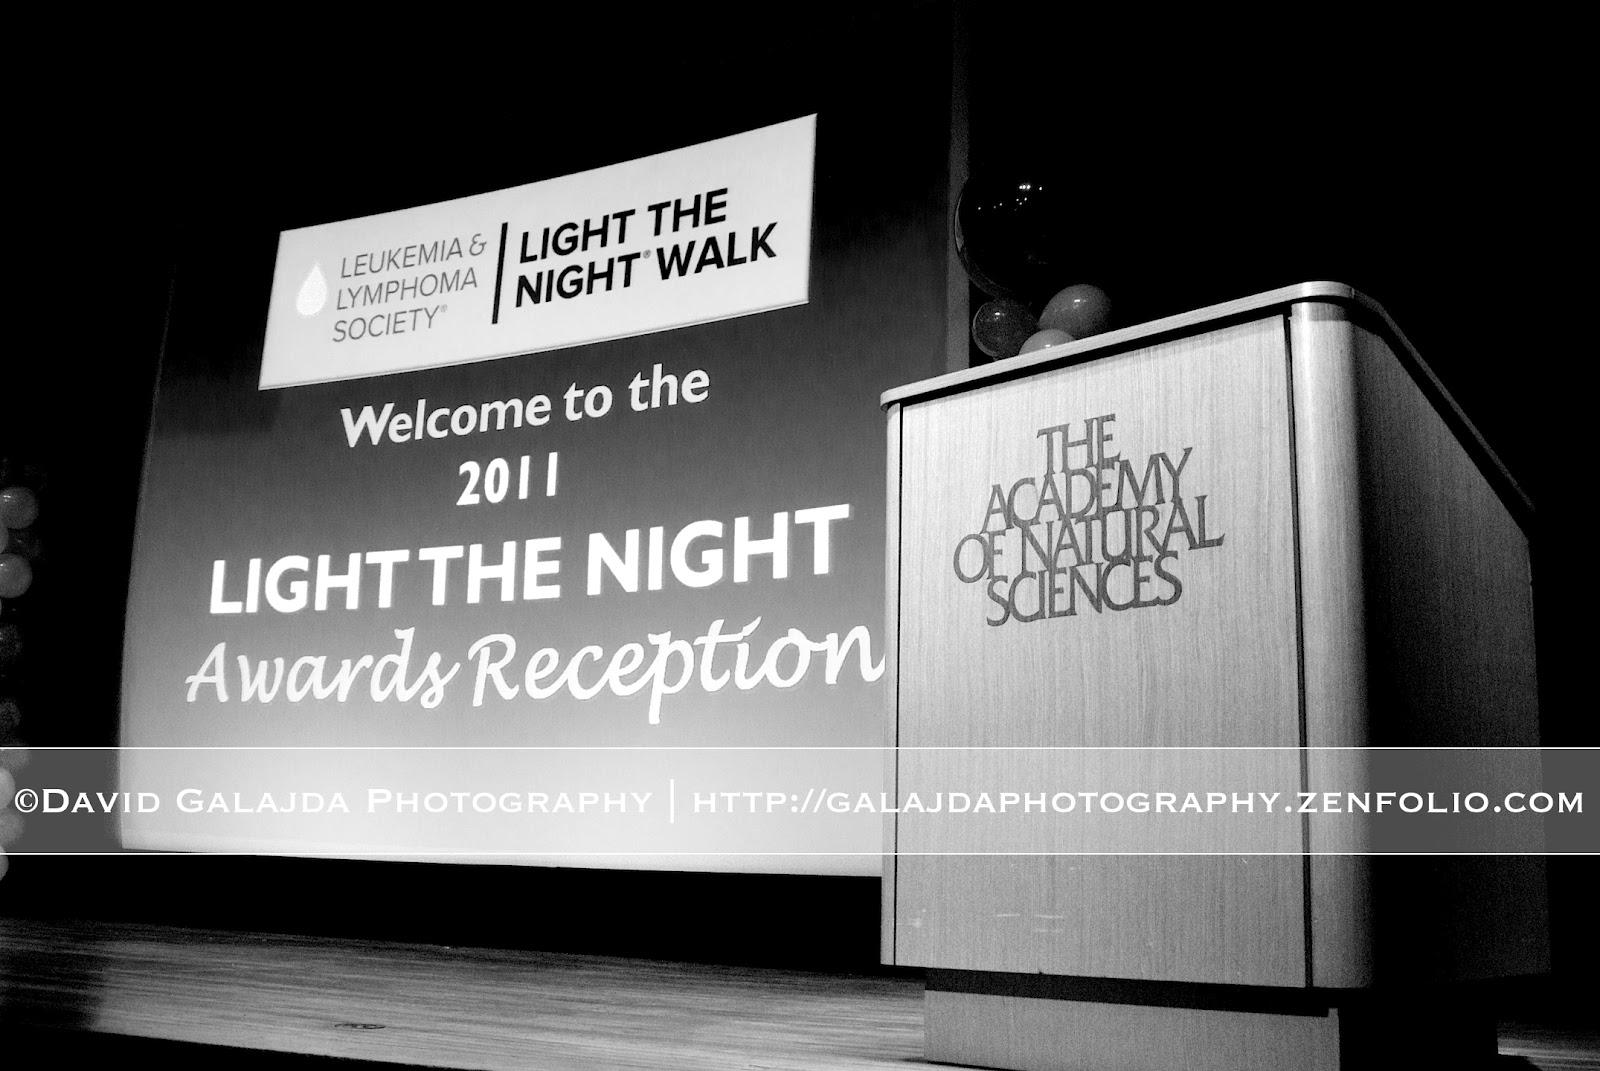 Photography by David Galajda  Leukemia Lymphoma Society  Light